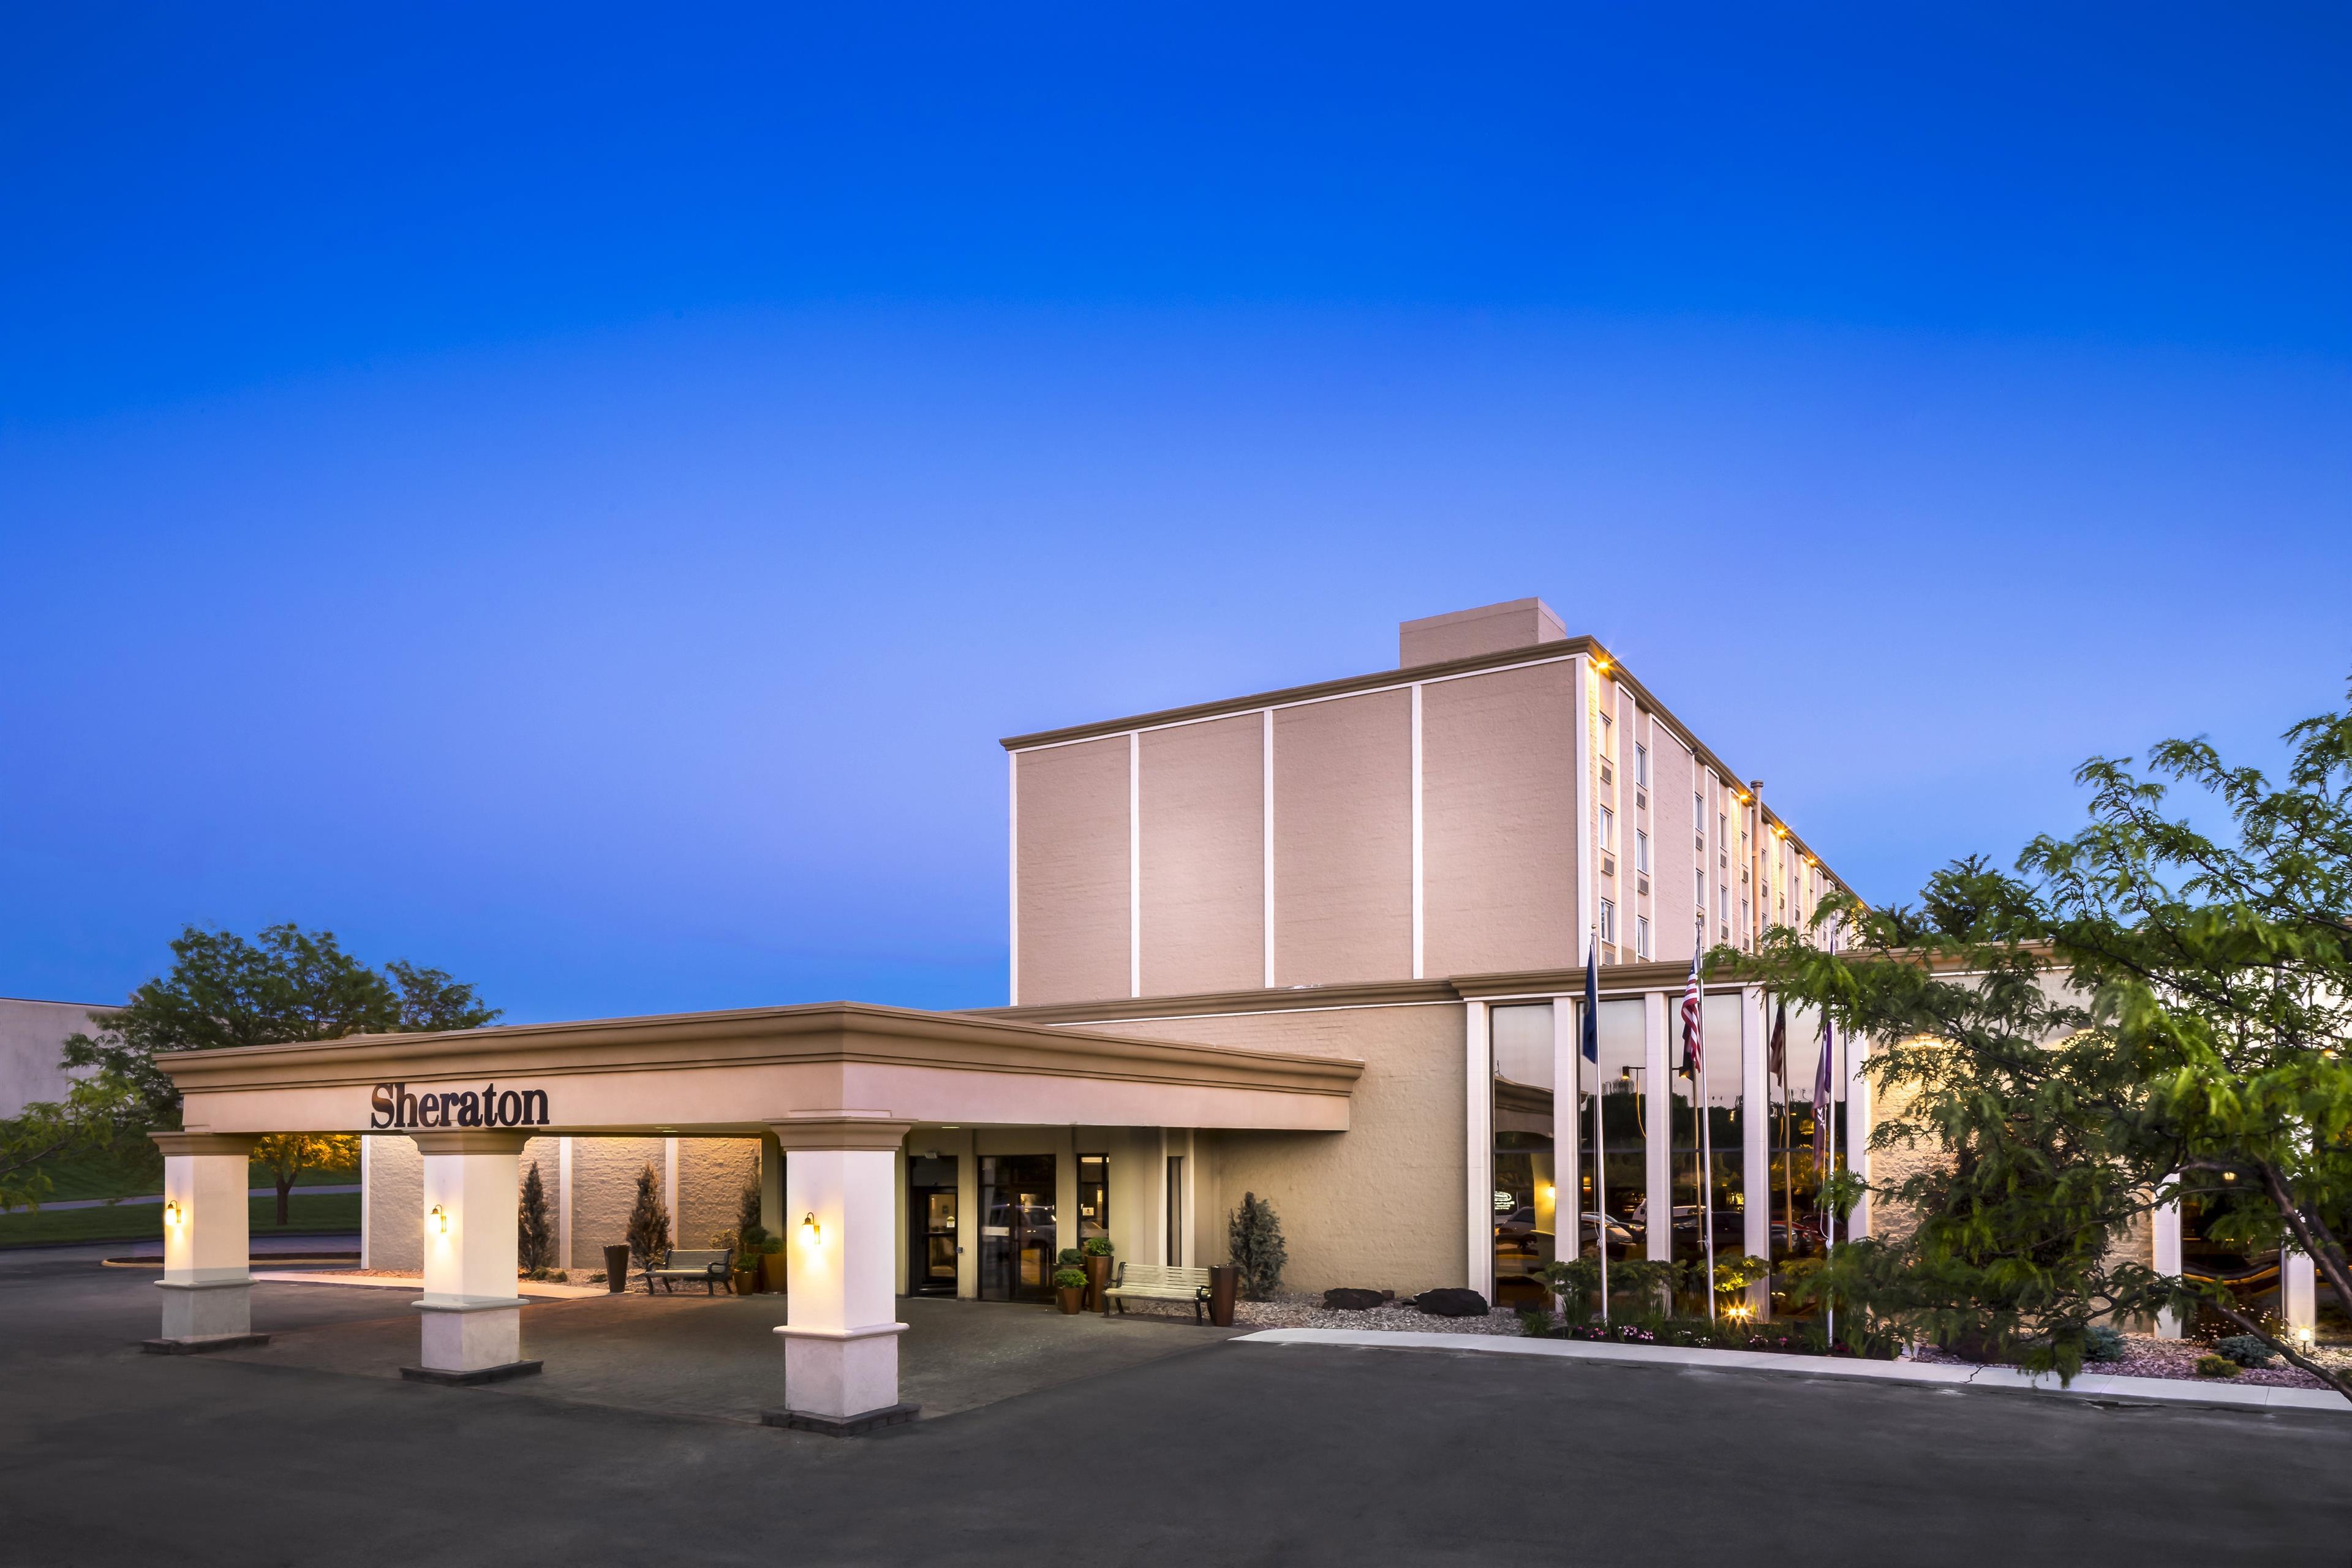 Sheraton Omaha Hotel image 11